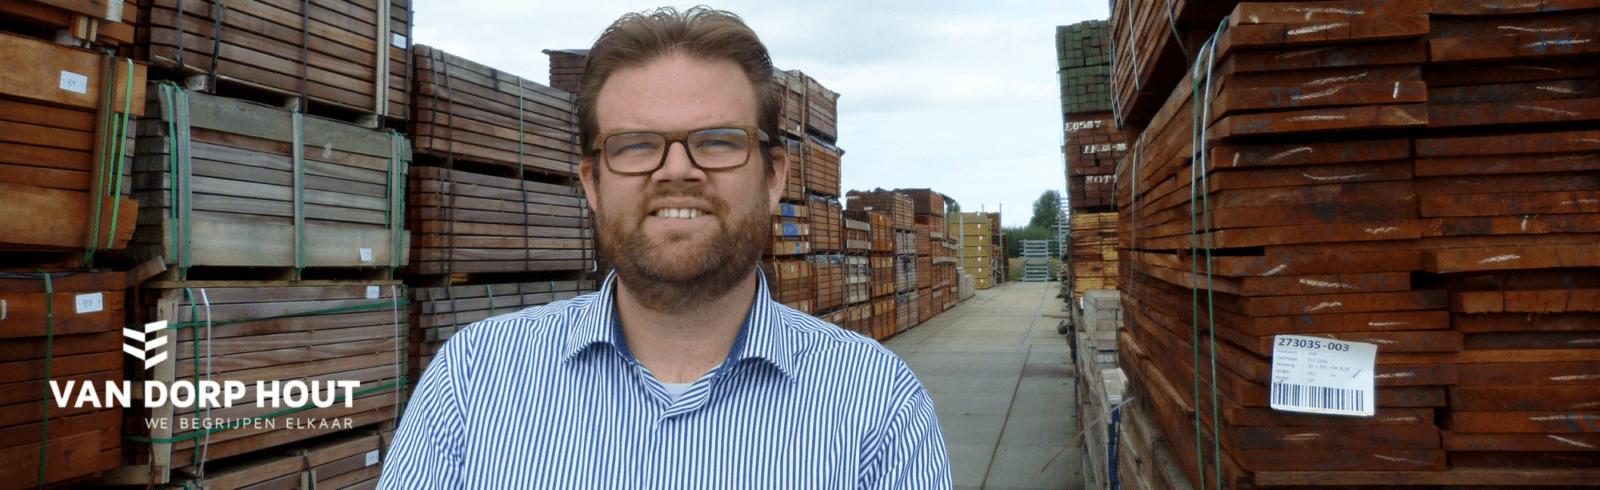 Henk-Arie Schra Van Dorp Hout Zoetermeer blij met telefonie ISO Groep